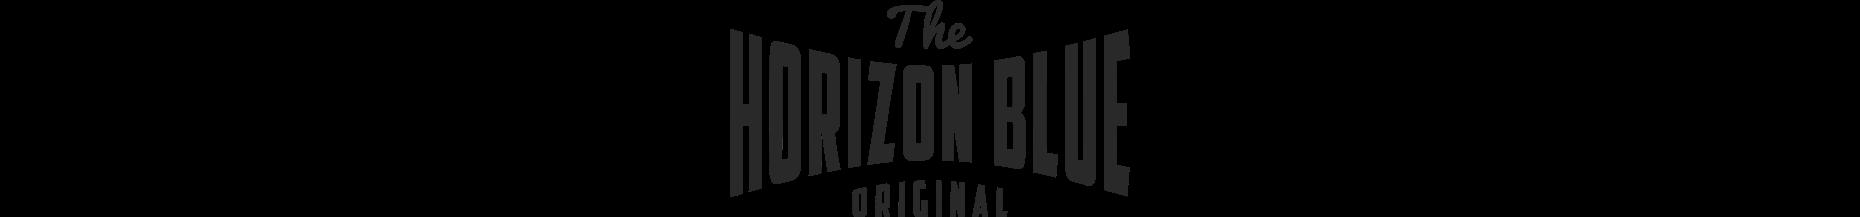 Tシャツ通販 Horizon Blue(ホリゾンブルー)